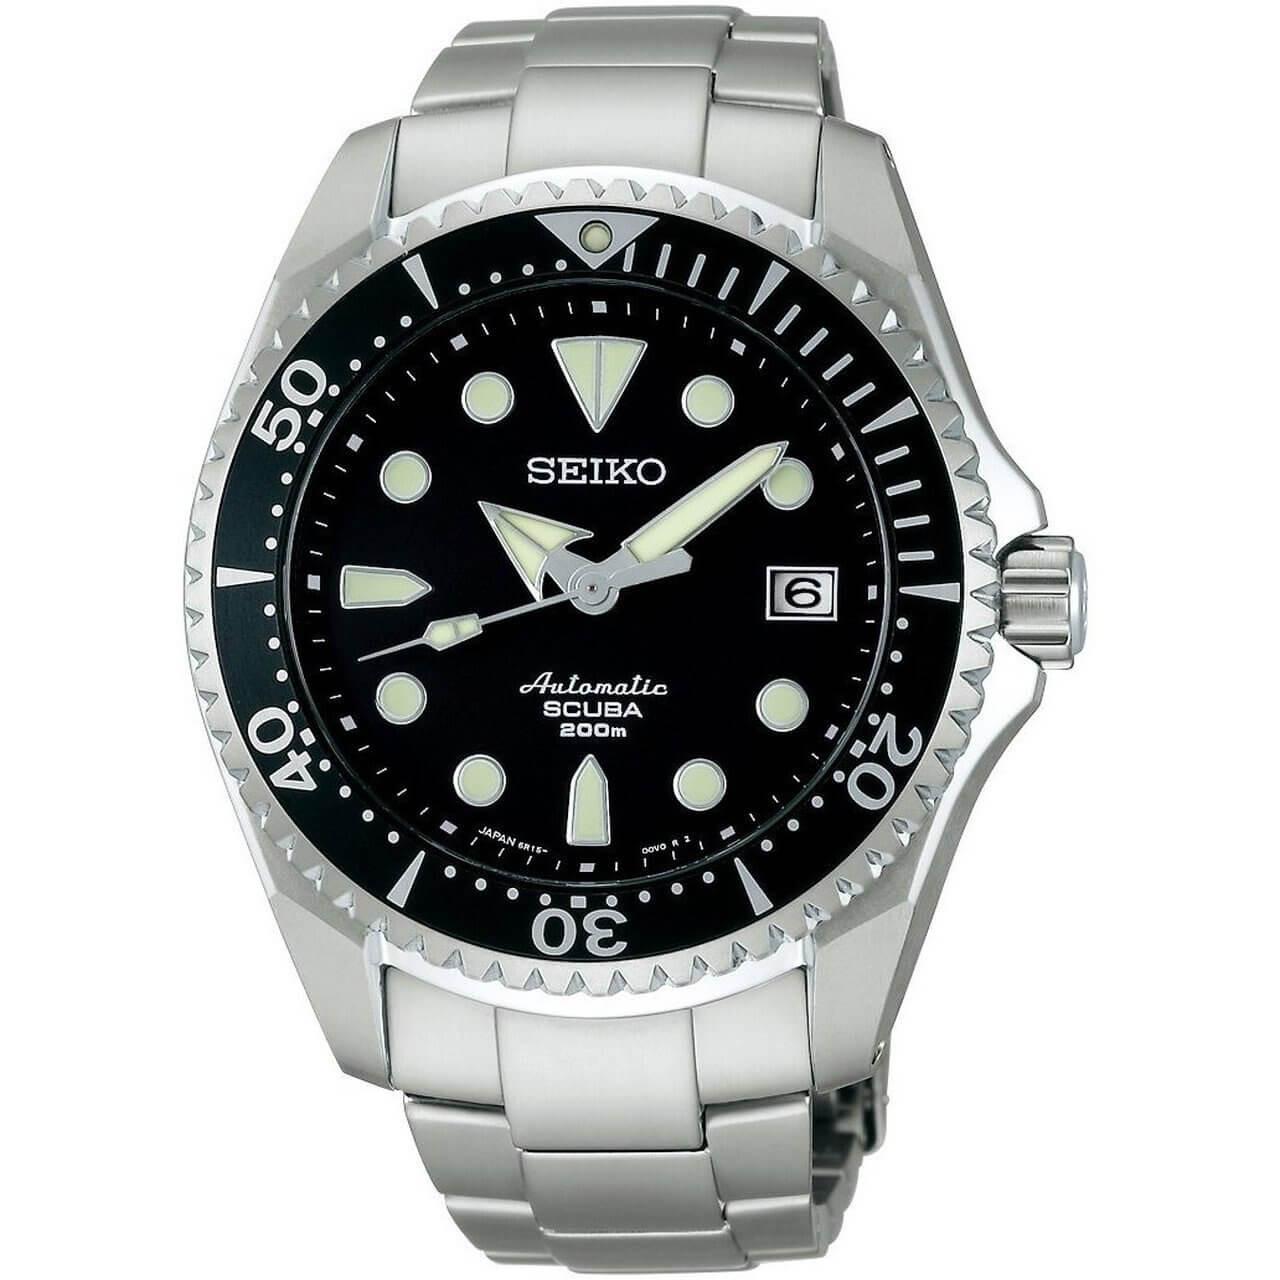 f4b021099 Seiko Prospex SBDC007 Diver Titanium Automatic - Shopping In Japan .NET